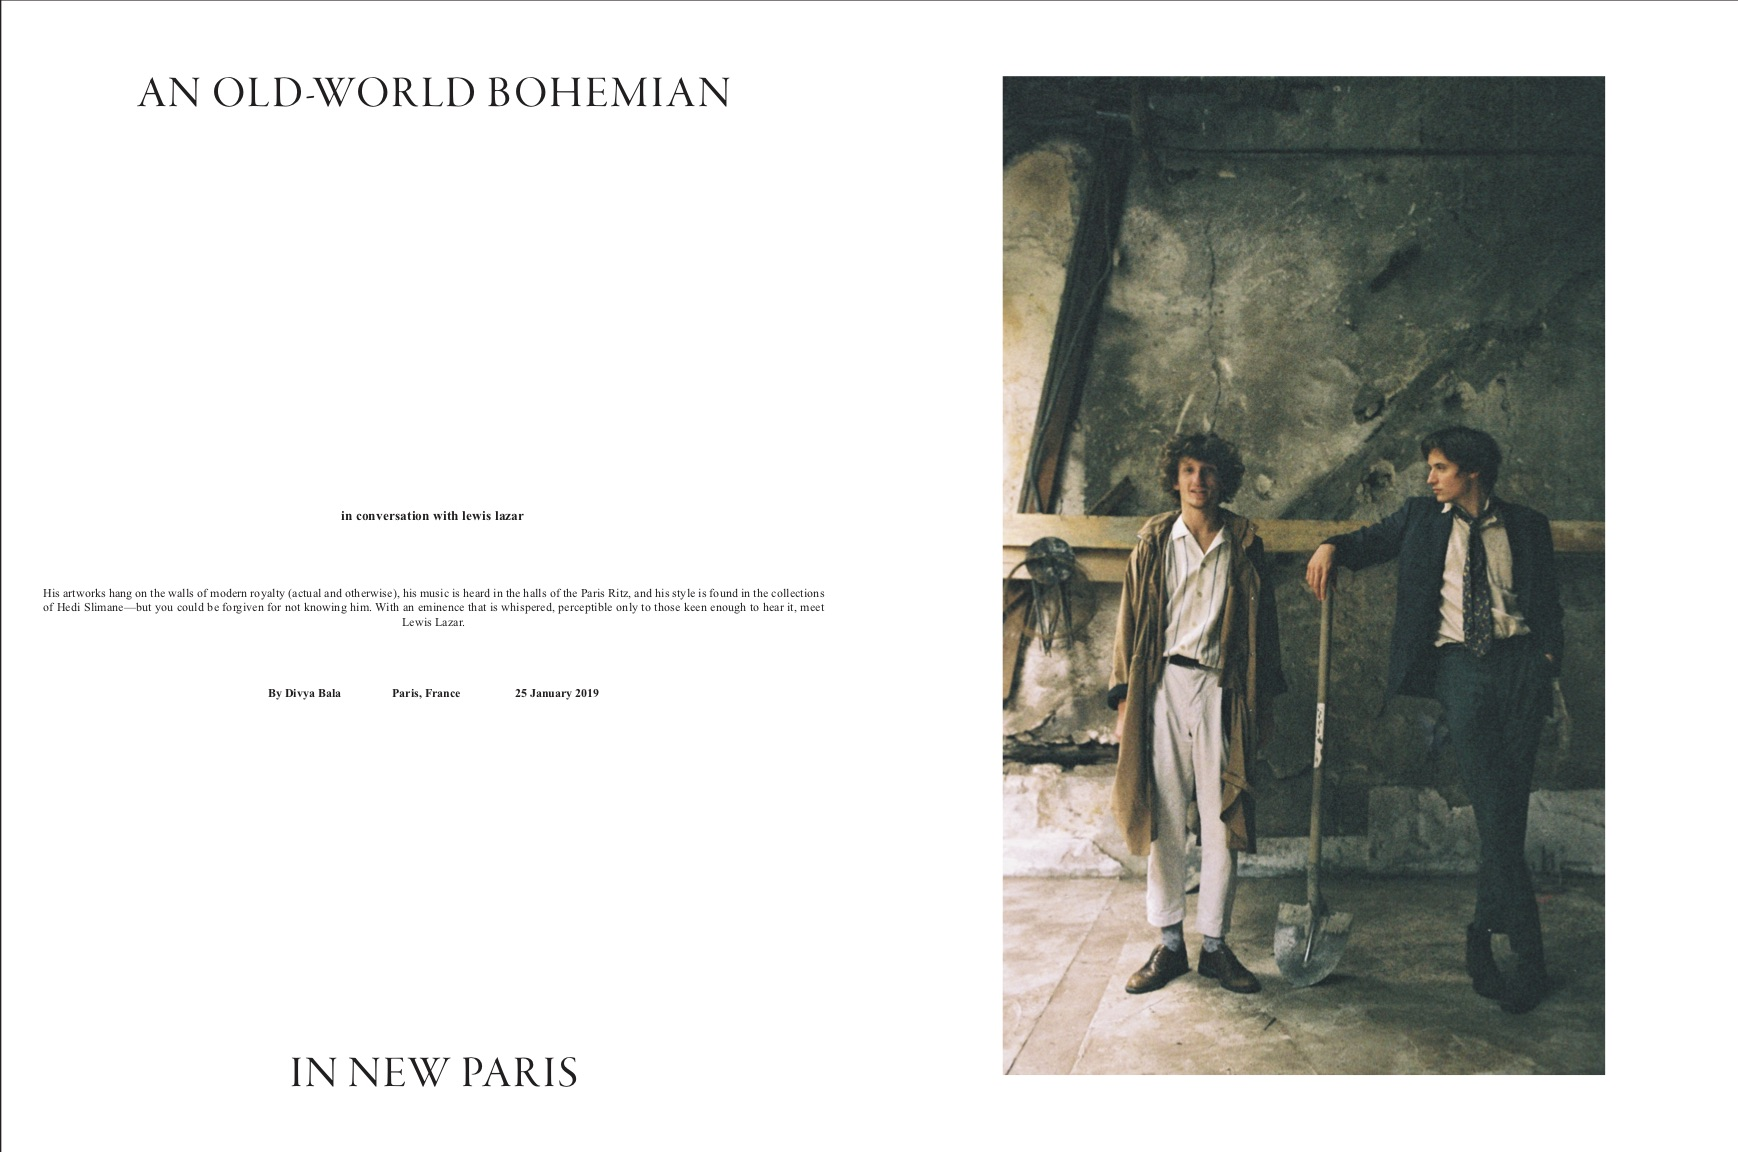 an old-world bohemian in new paris.jpg